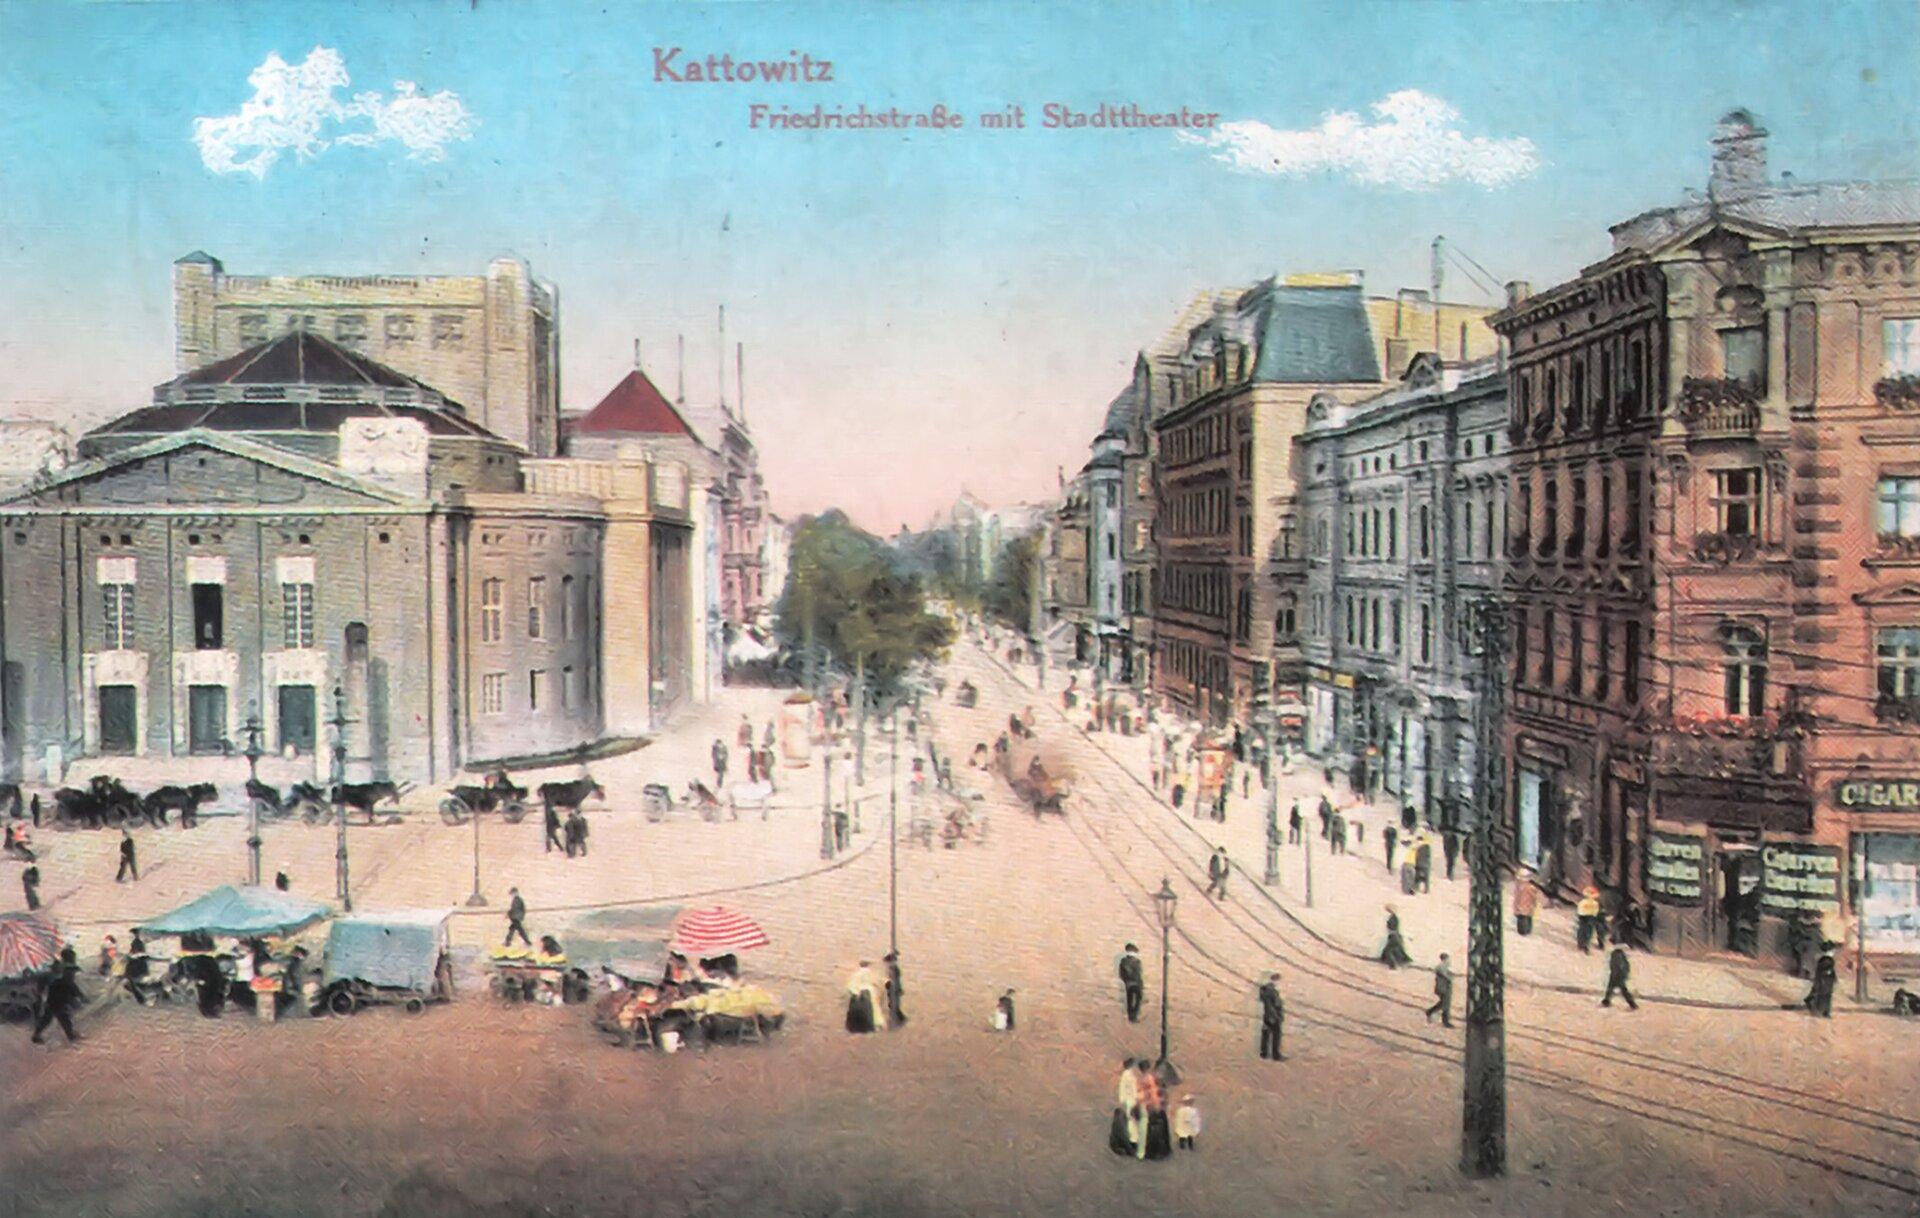 Stare Katowice Stare Katowice Źródło: Lestat, domena publiczna.